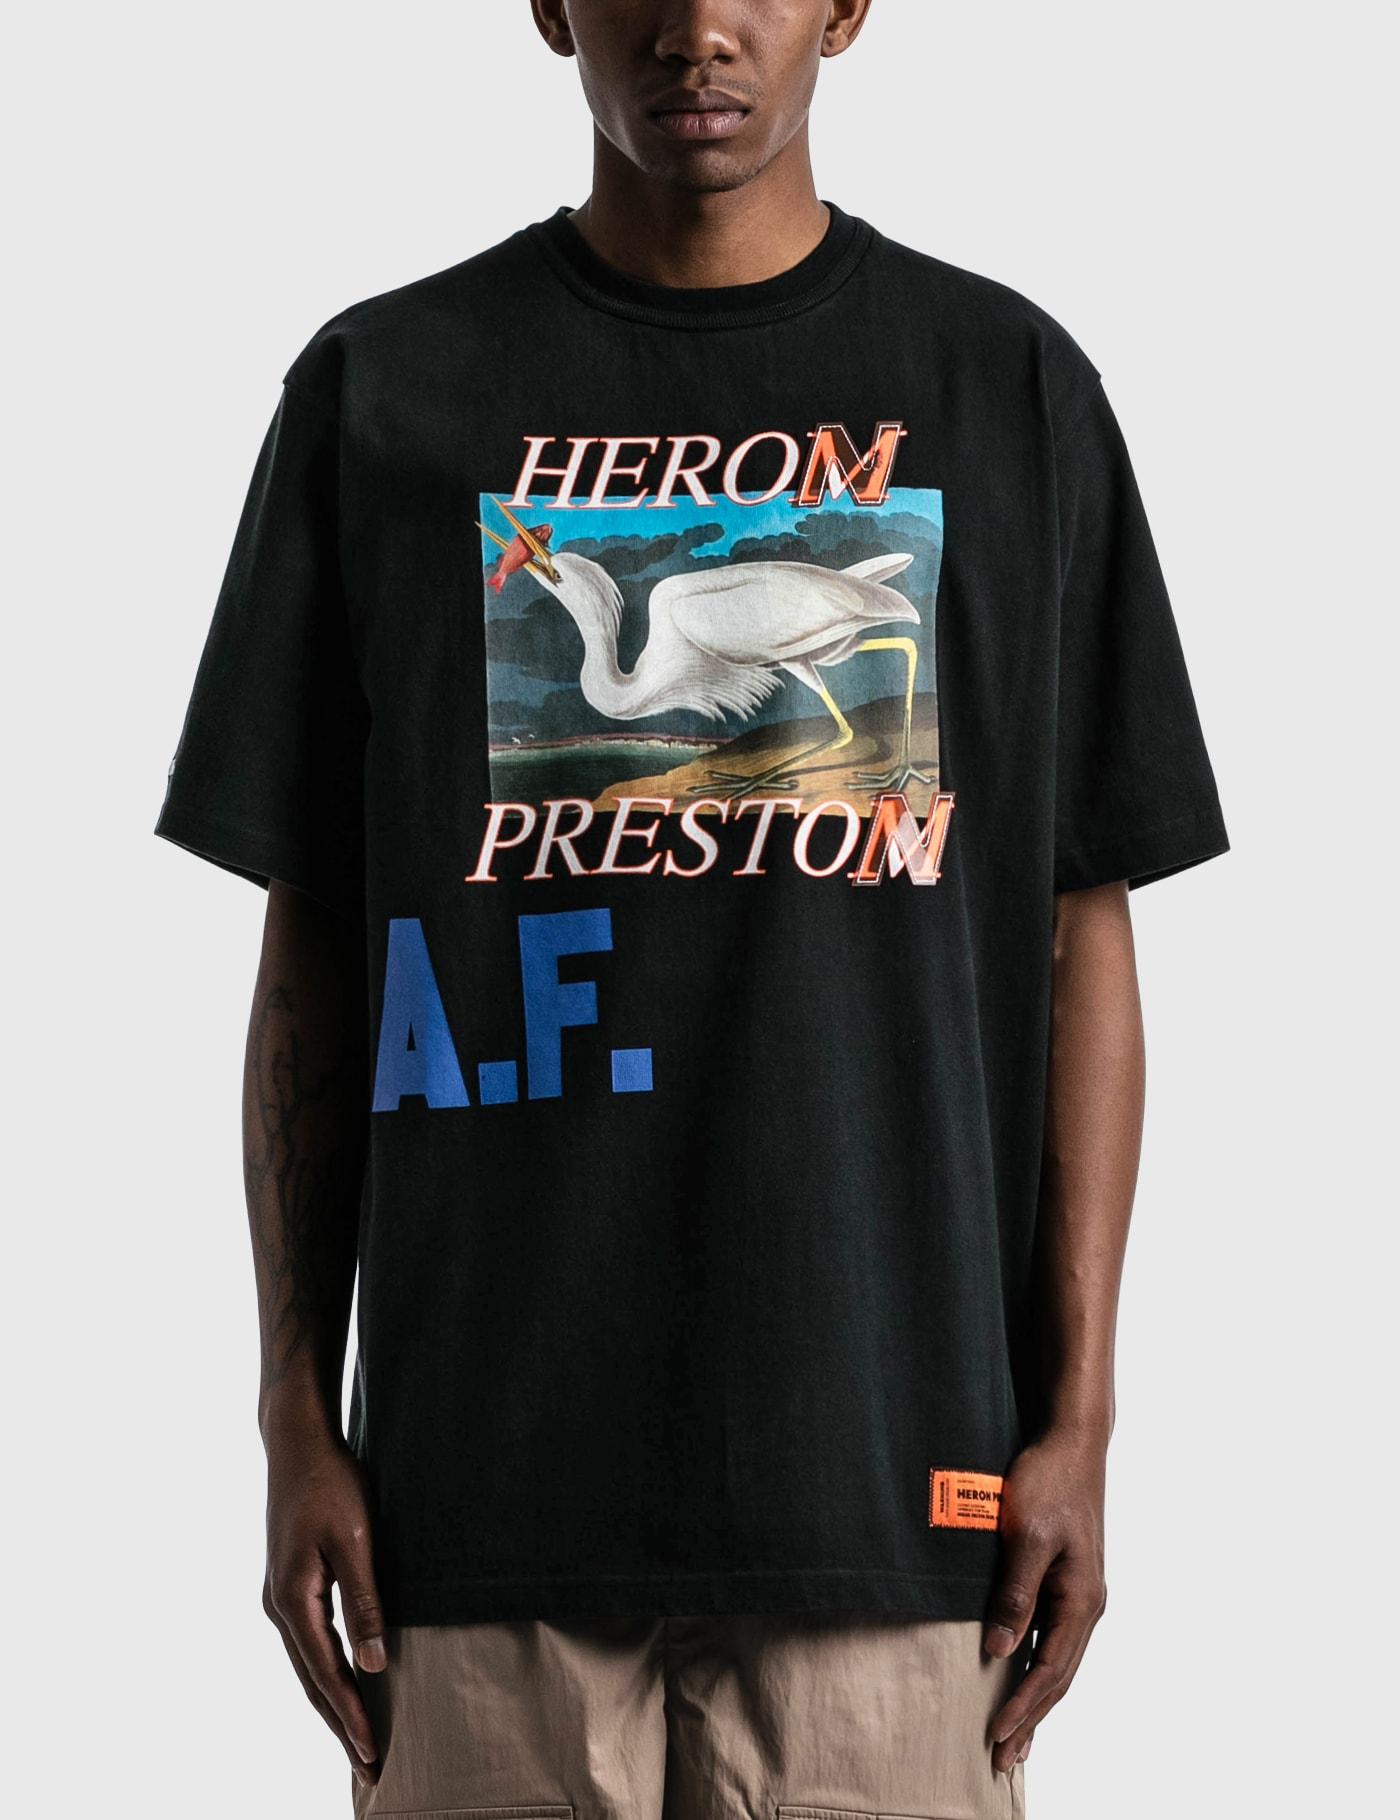 Heron Preston Cottons HERON A.F. T-SHIRT